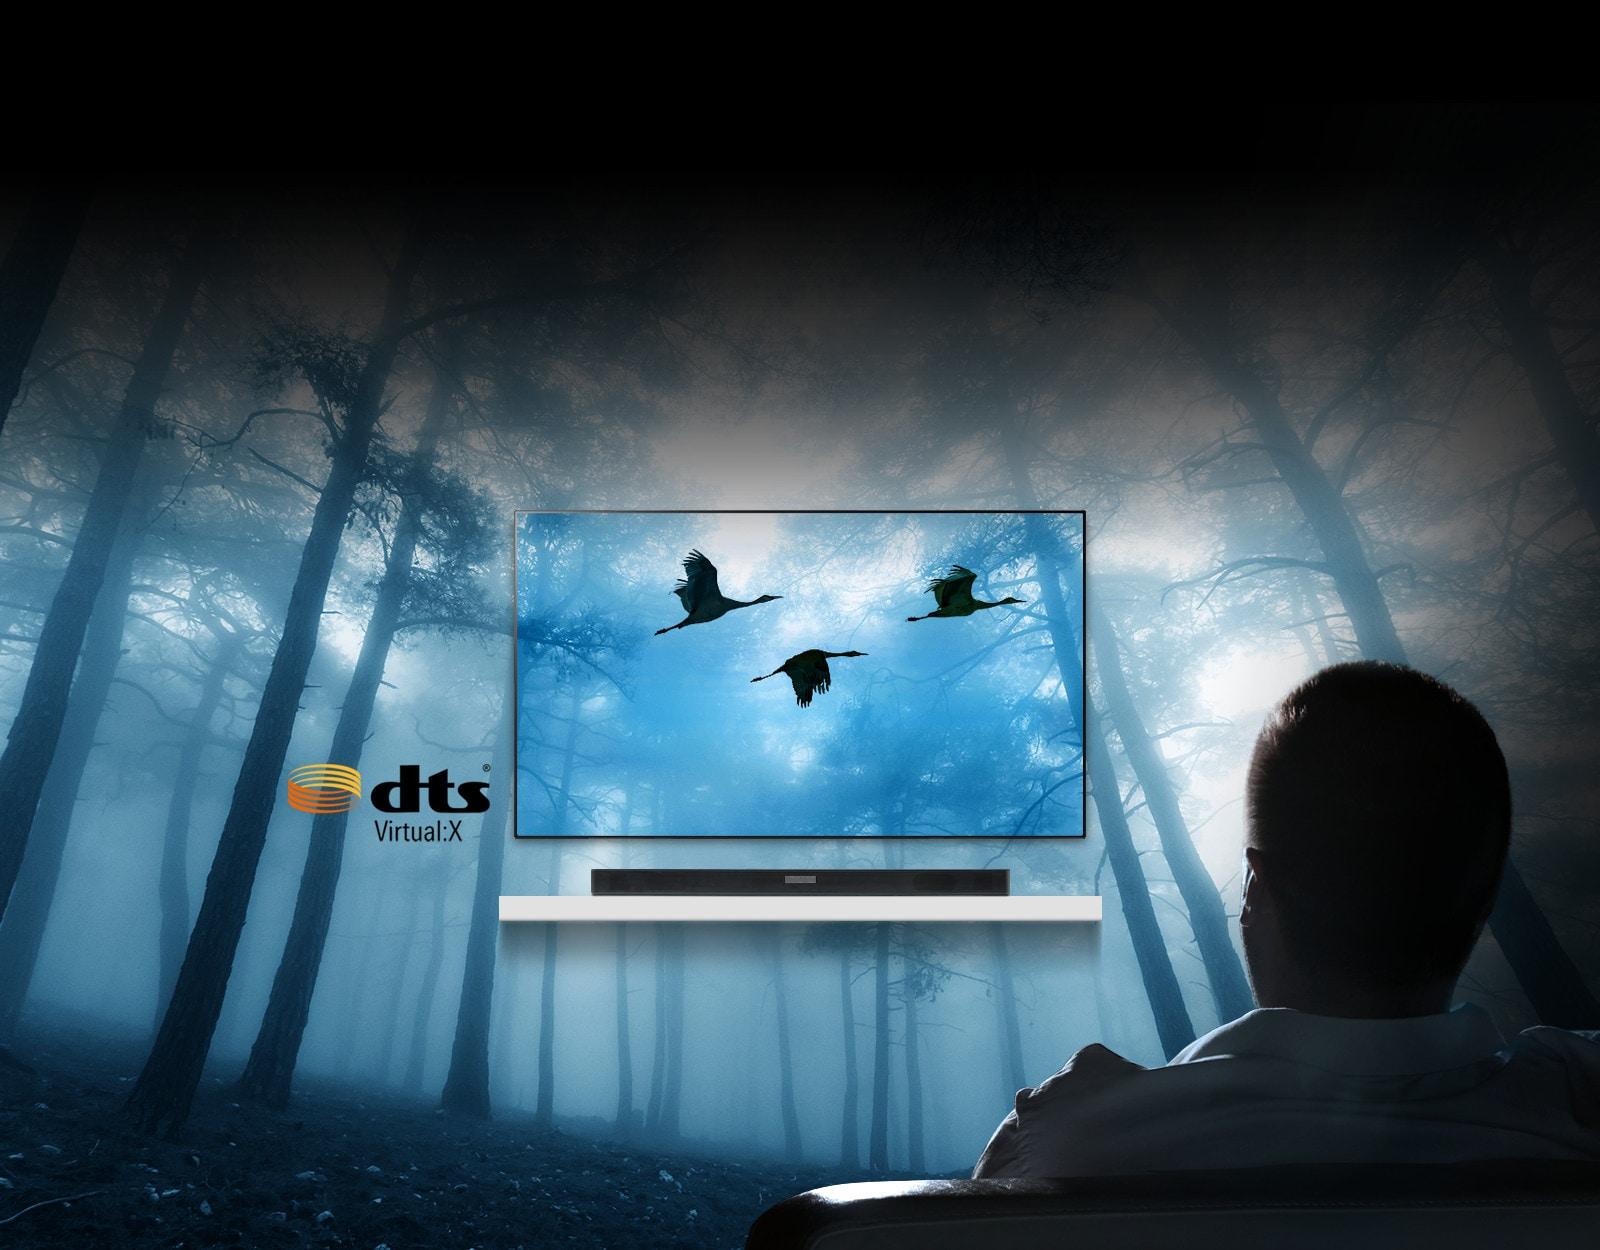 01_SK5_DTS_Virtual_X_Promises_a_Full_Three_dimensional_Surround_Sound_Desktop_13042018